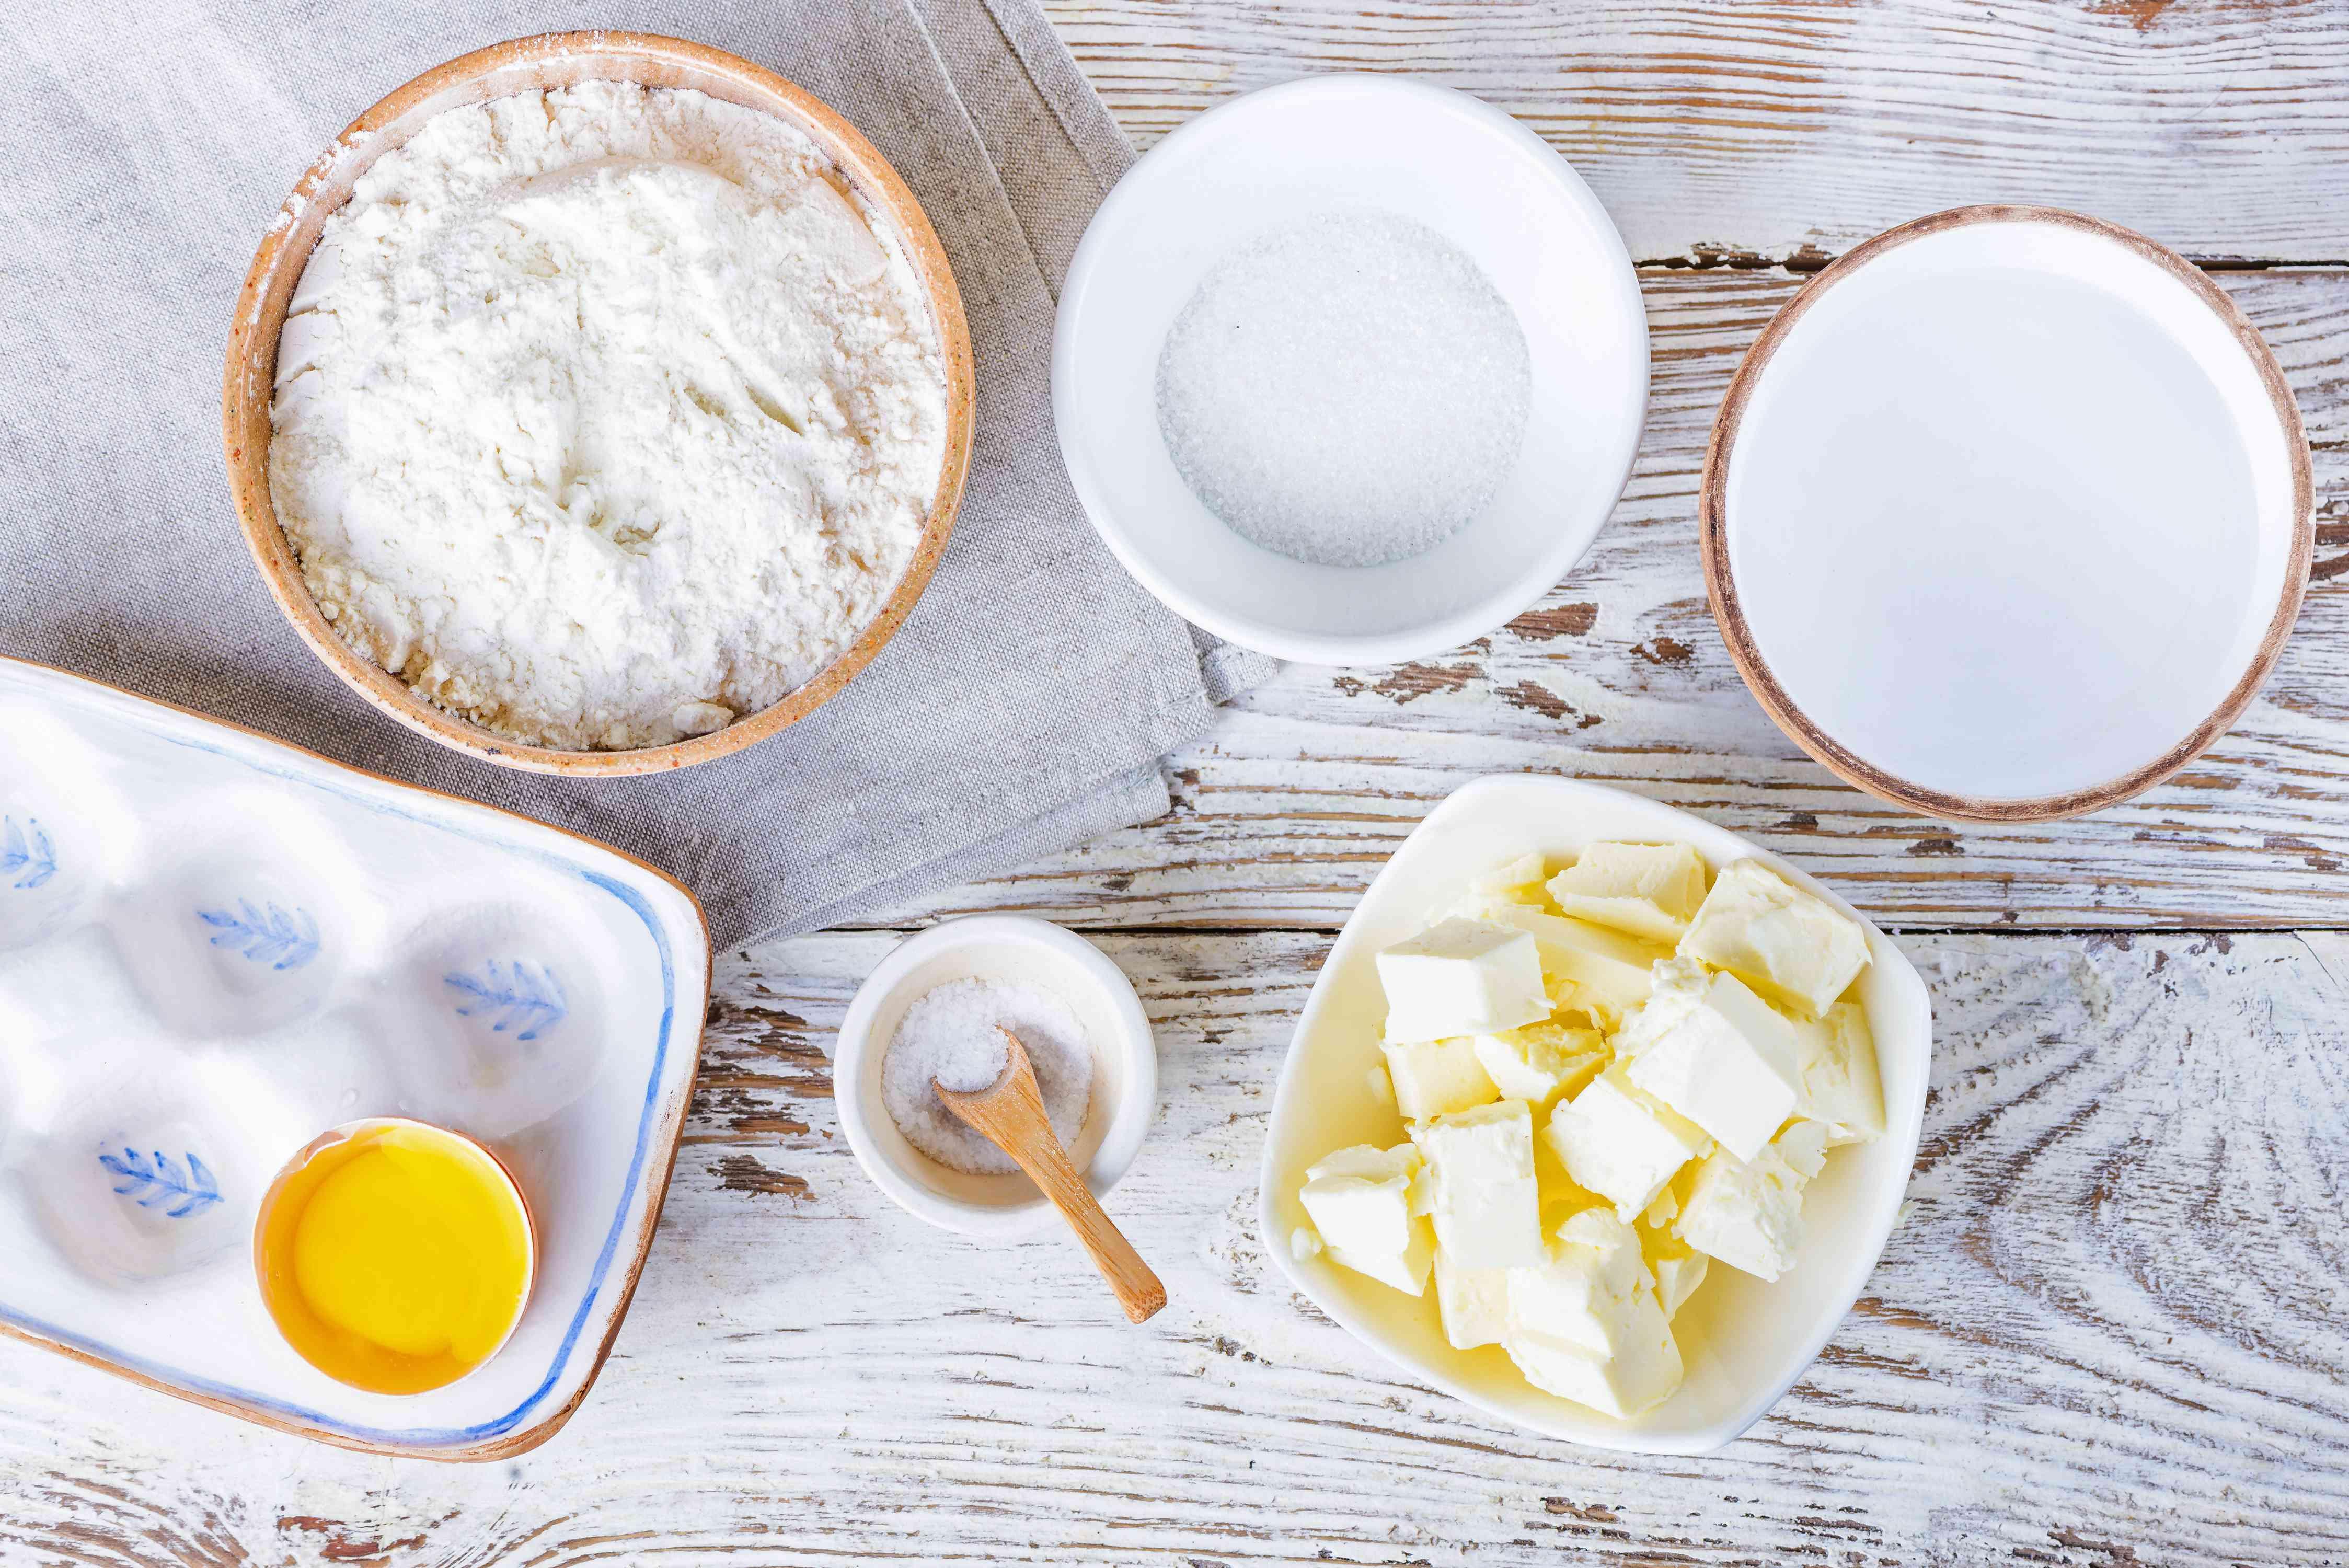 Ingredients for tart ingredients